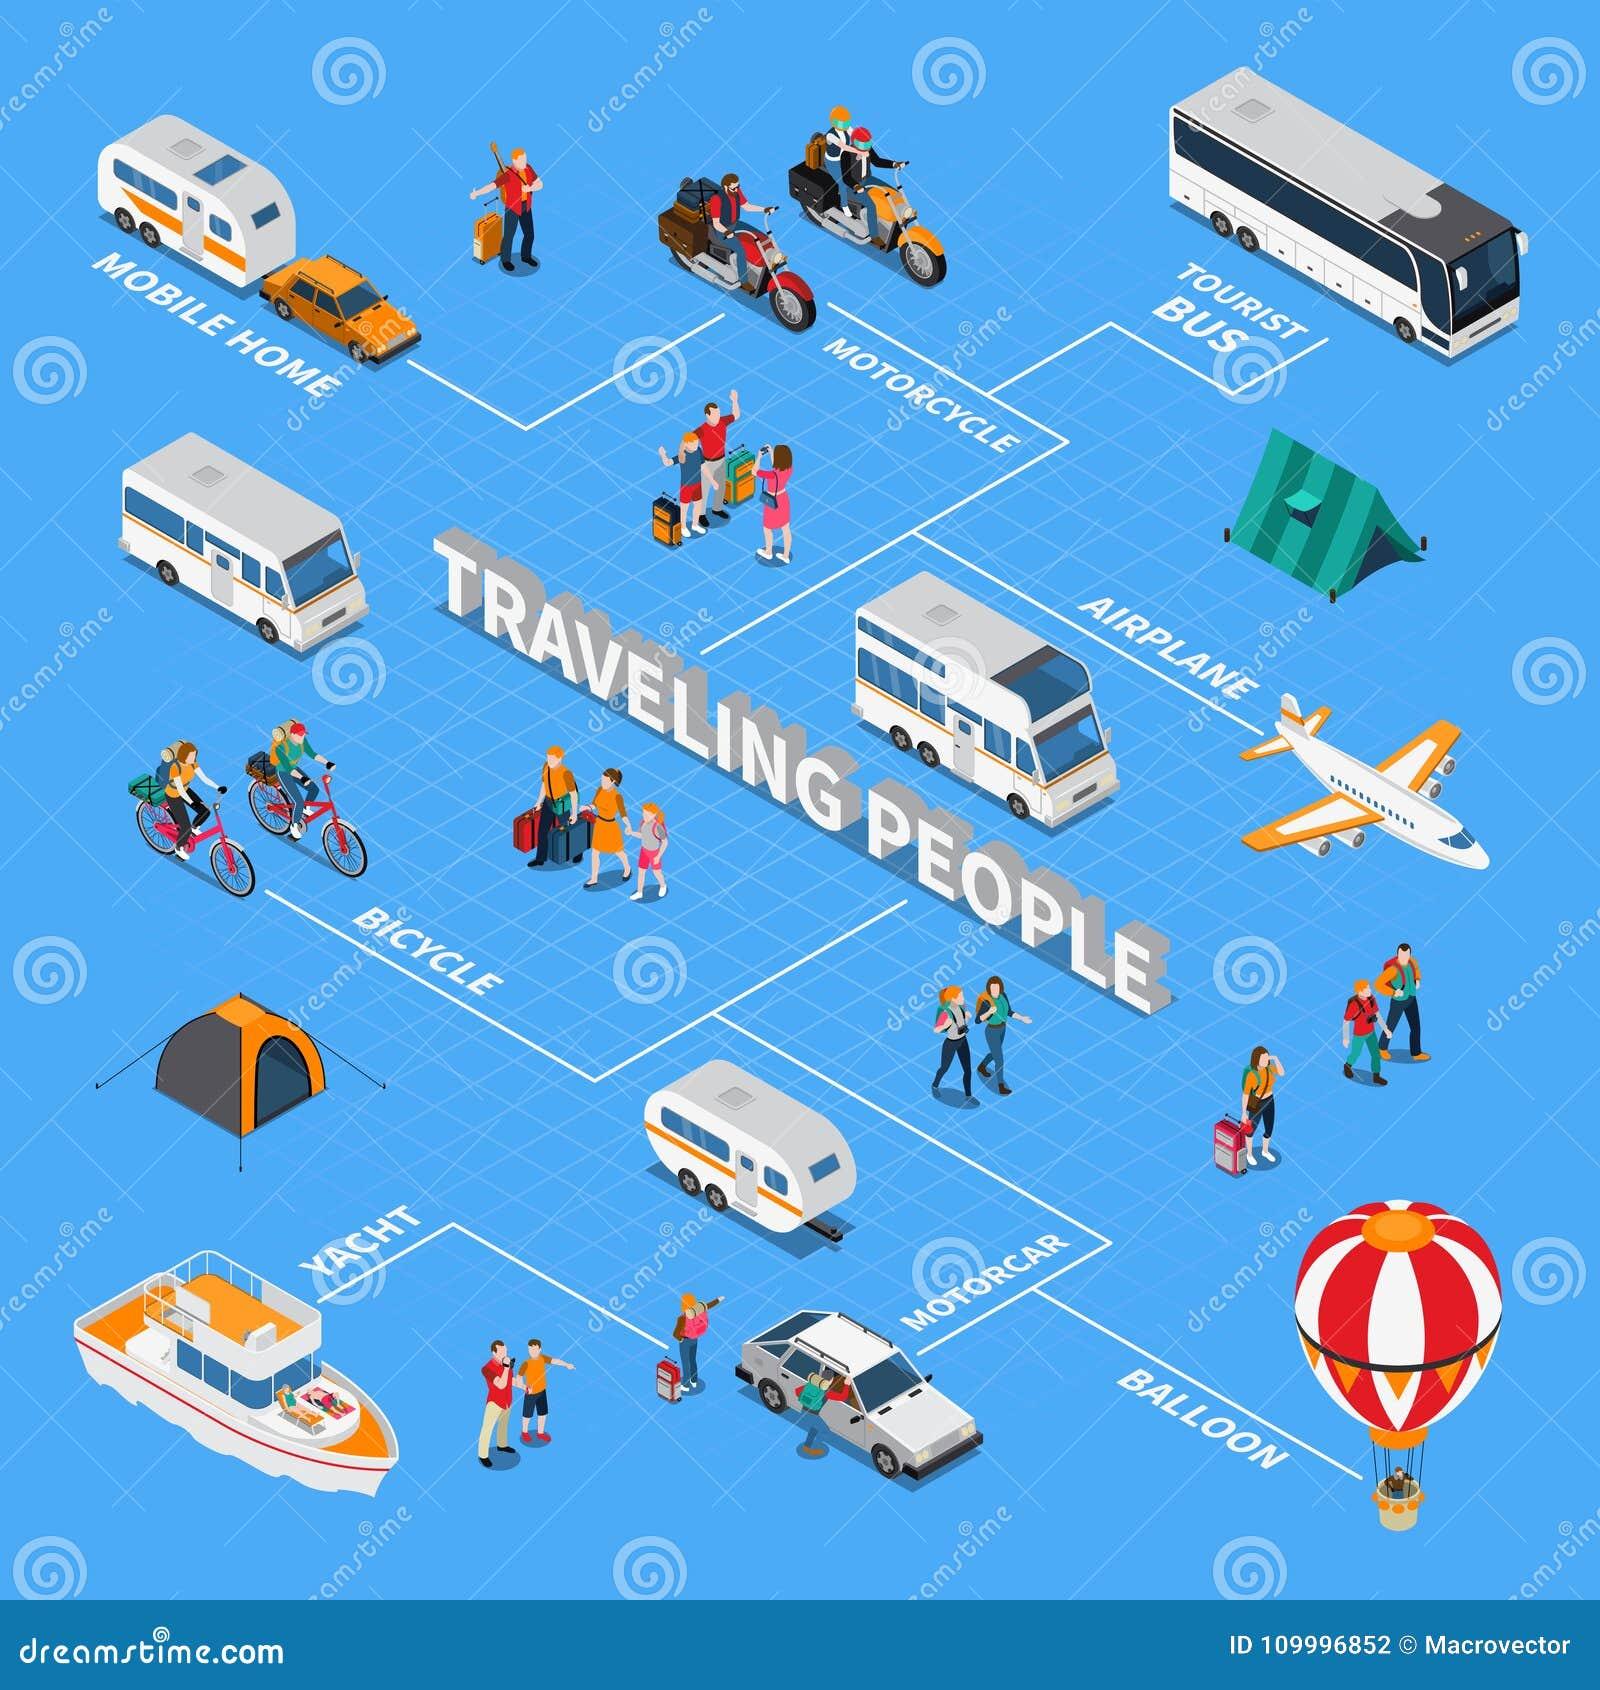 Traveling People Isometric Flowchart